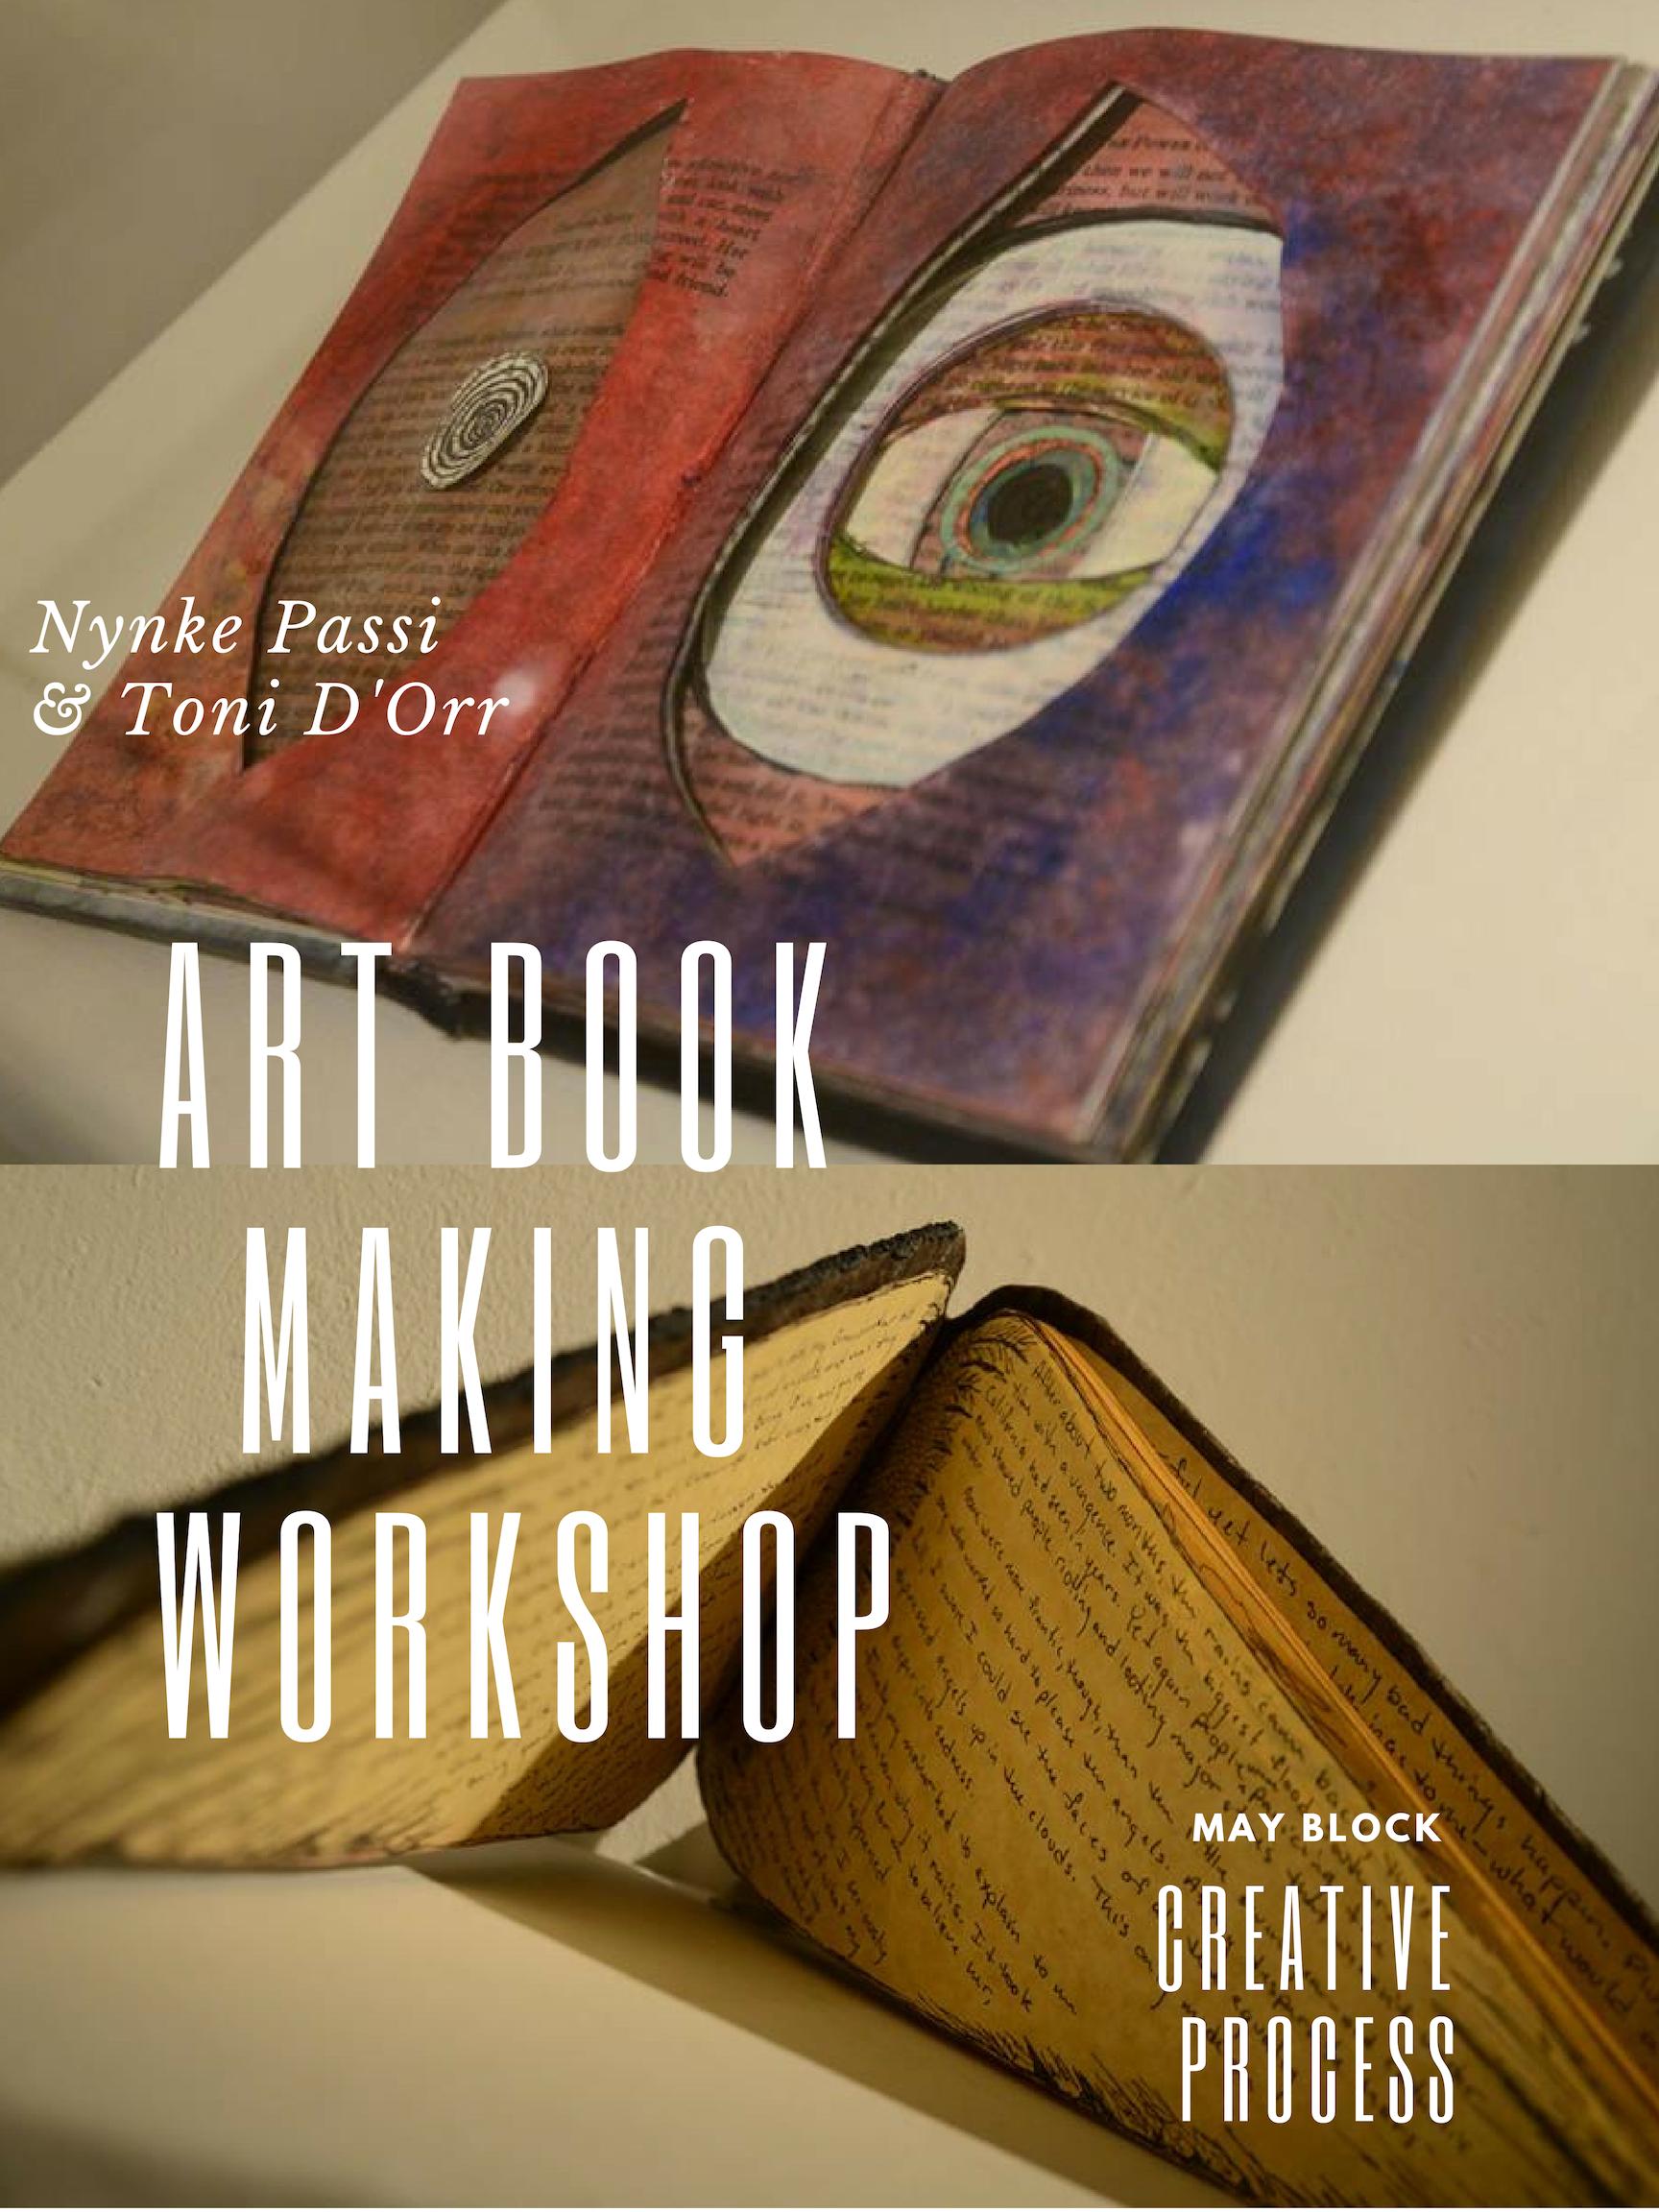 Art Book Making Workshop.jpg